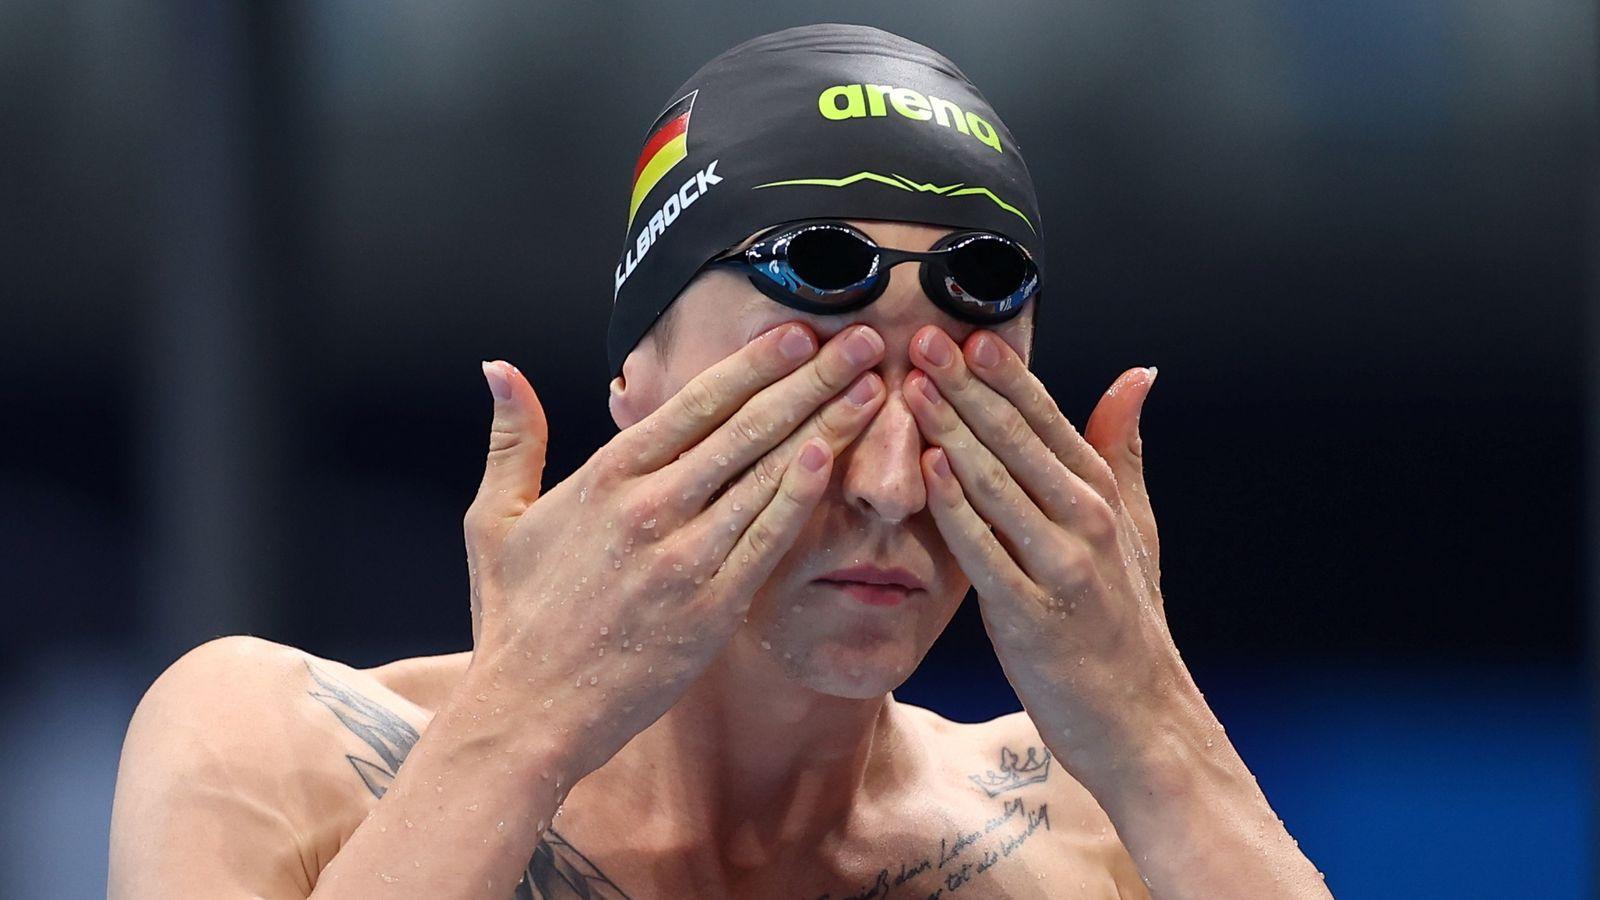 Swimming - Men's 800m Freestyle - Final